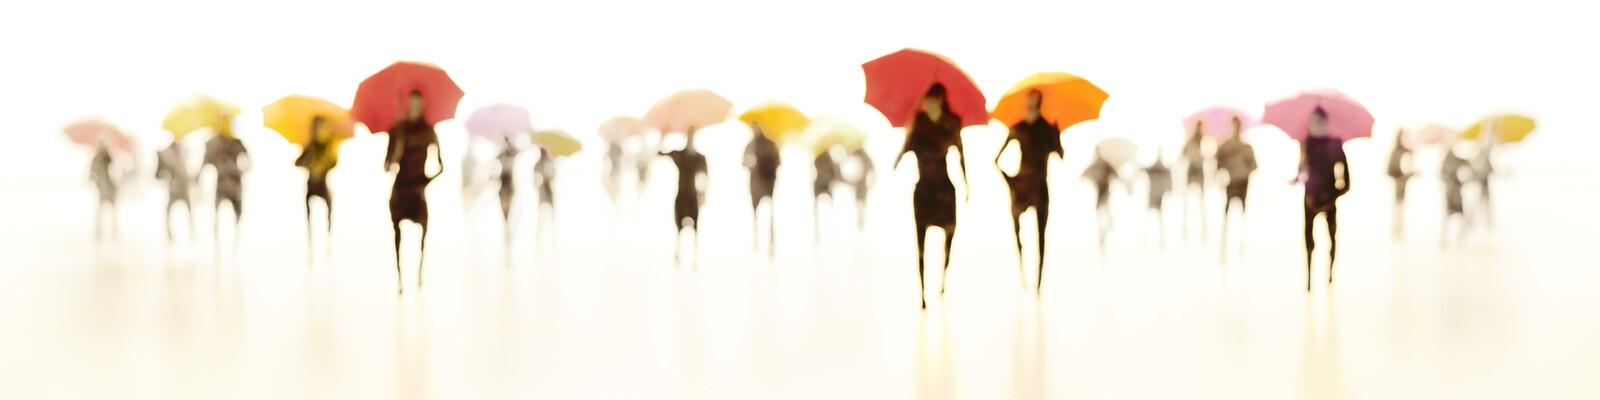 Umbrellas X - Joerg Maxzin